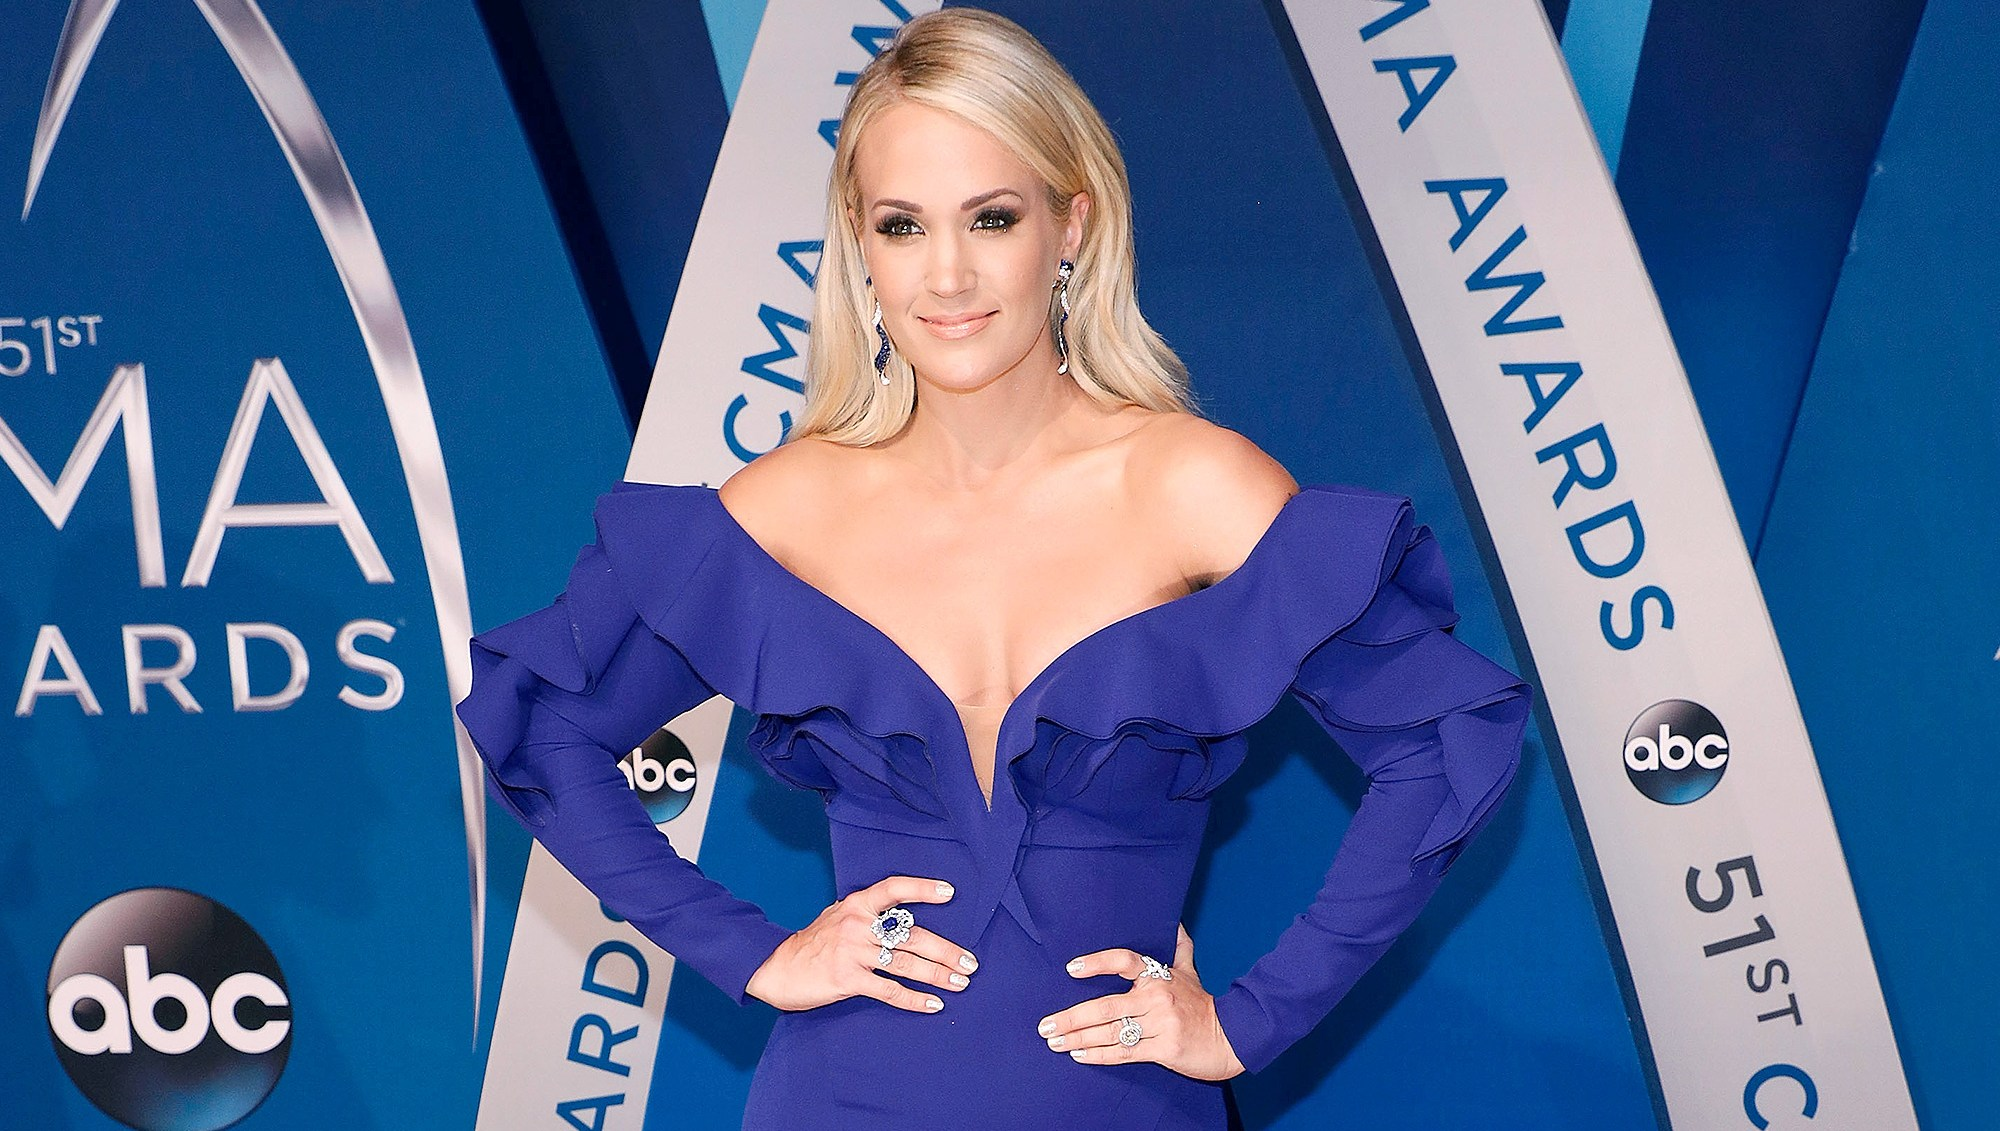 Carrie Underwood, ACM Awards, Cry Pretty